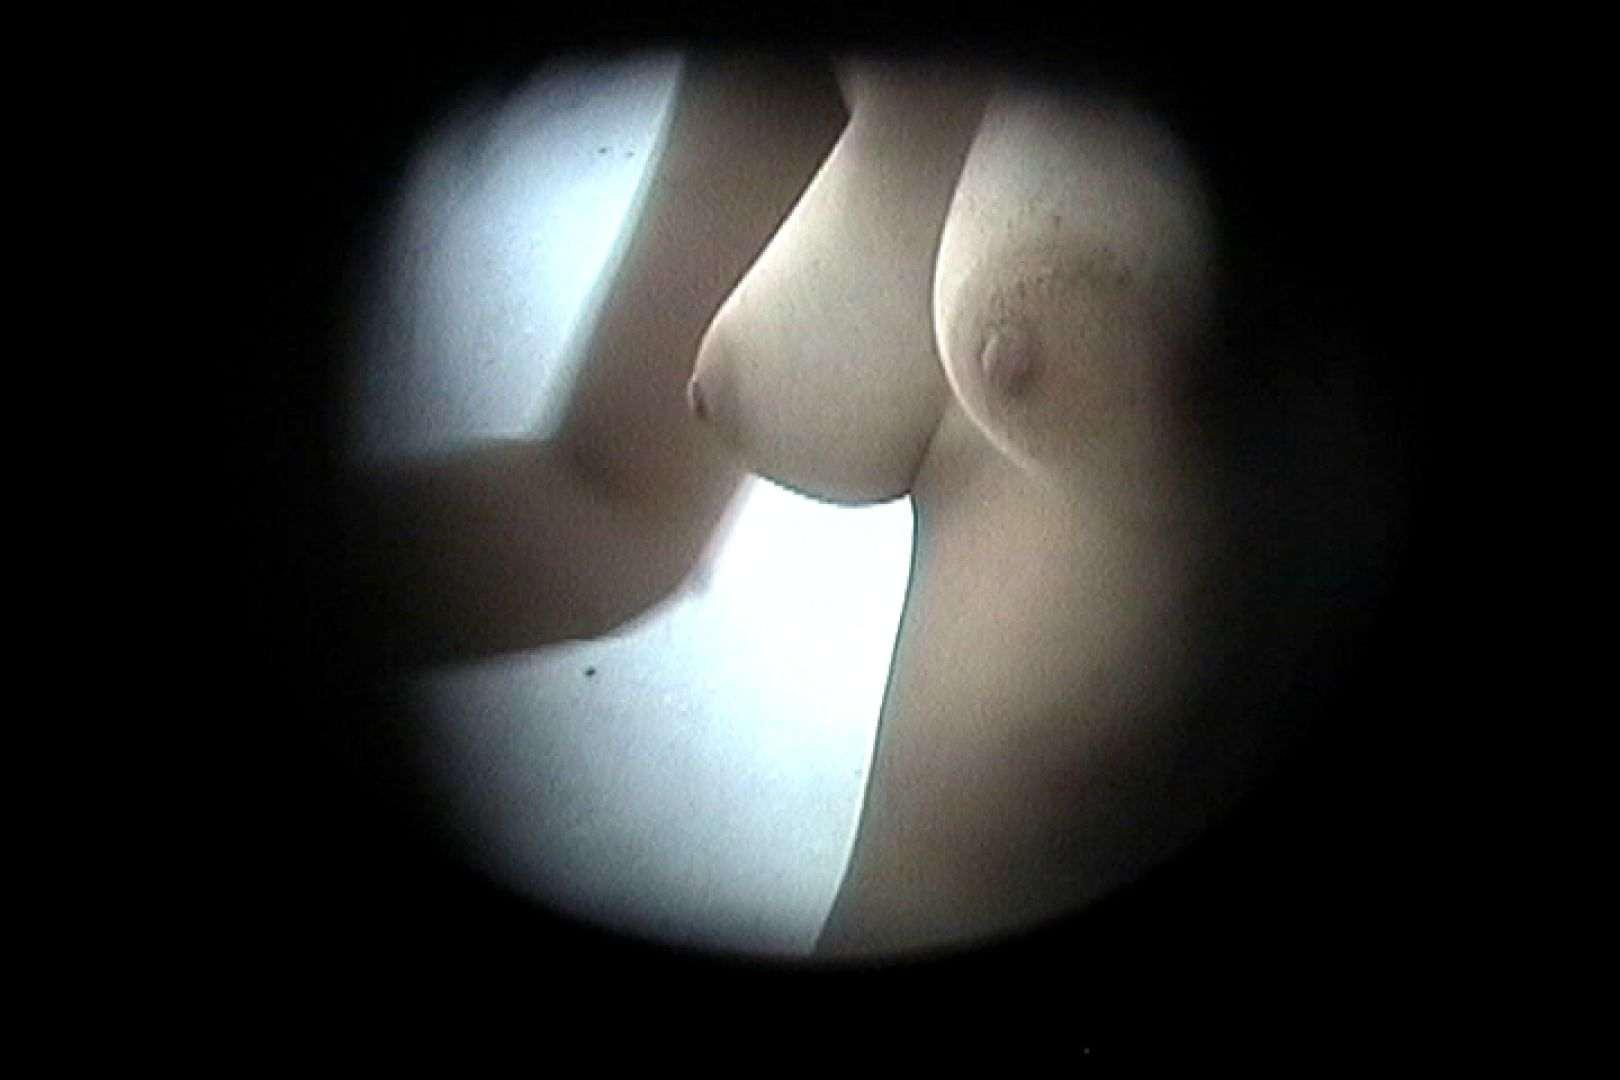 No.46 マシュマロ巨乳が目の前でプルプル 巨乳 セックス画像 64pic 22